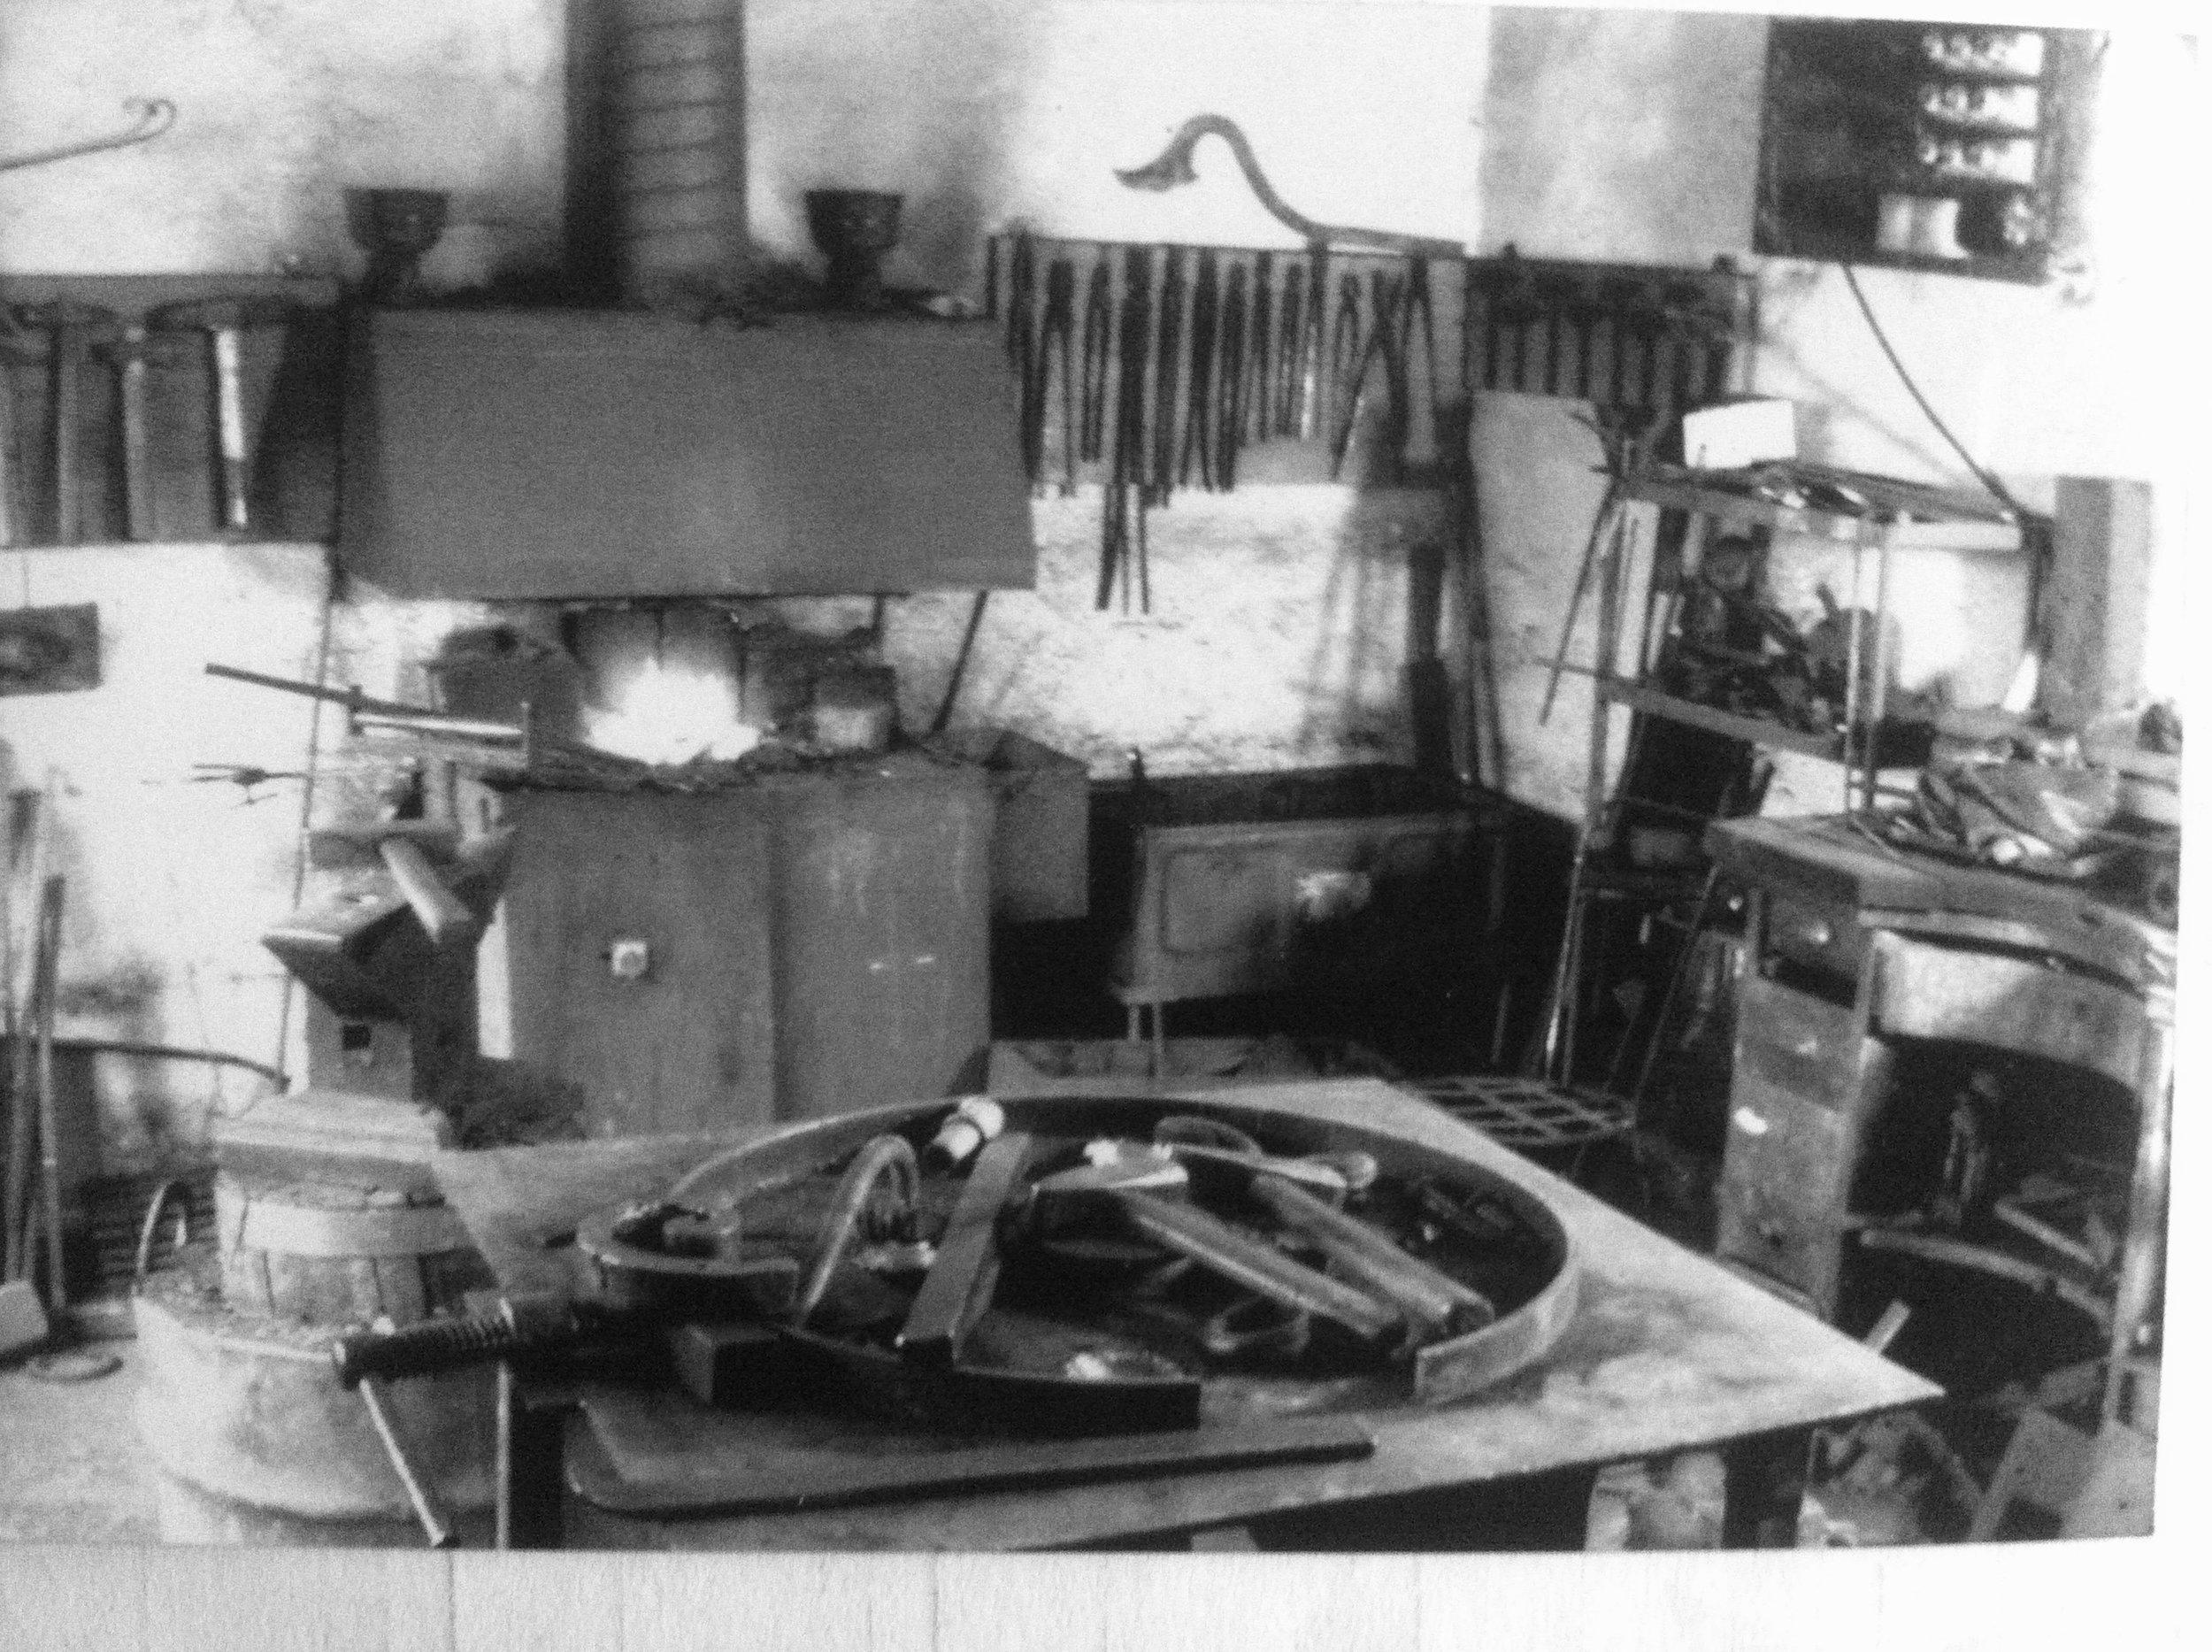 kovano gvozdje - wrought iron